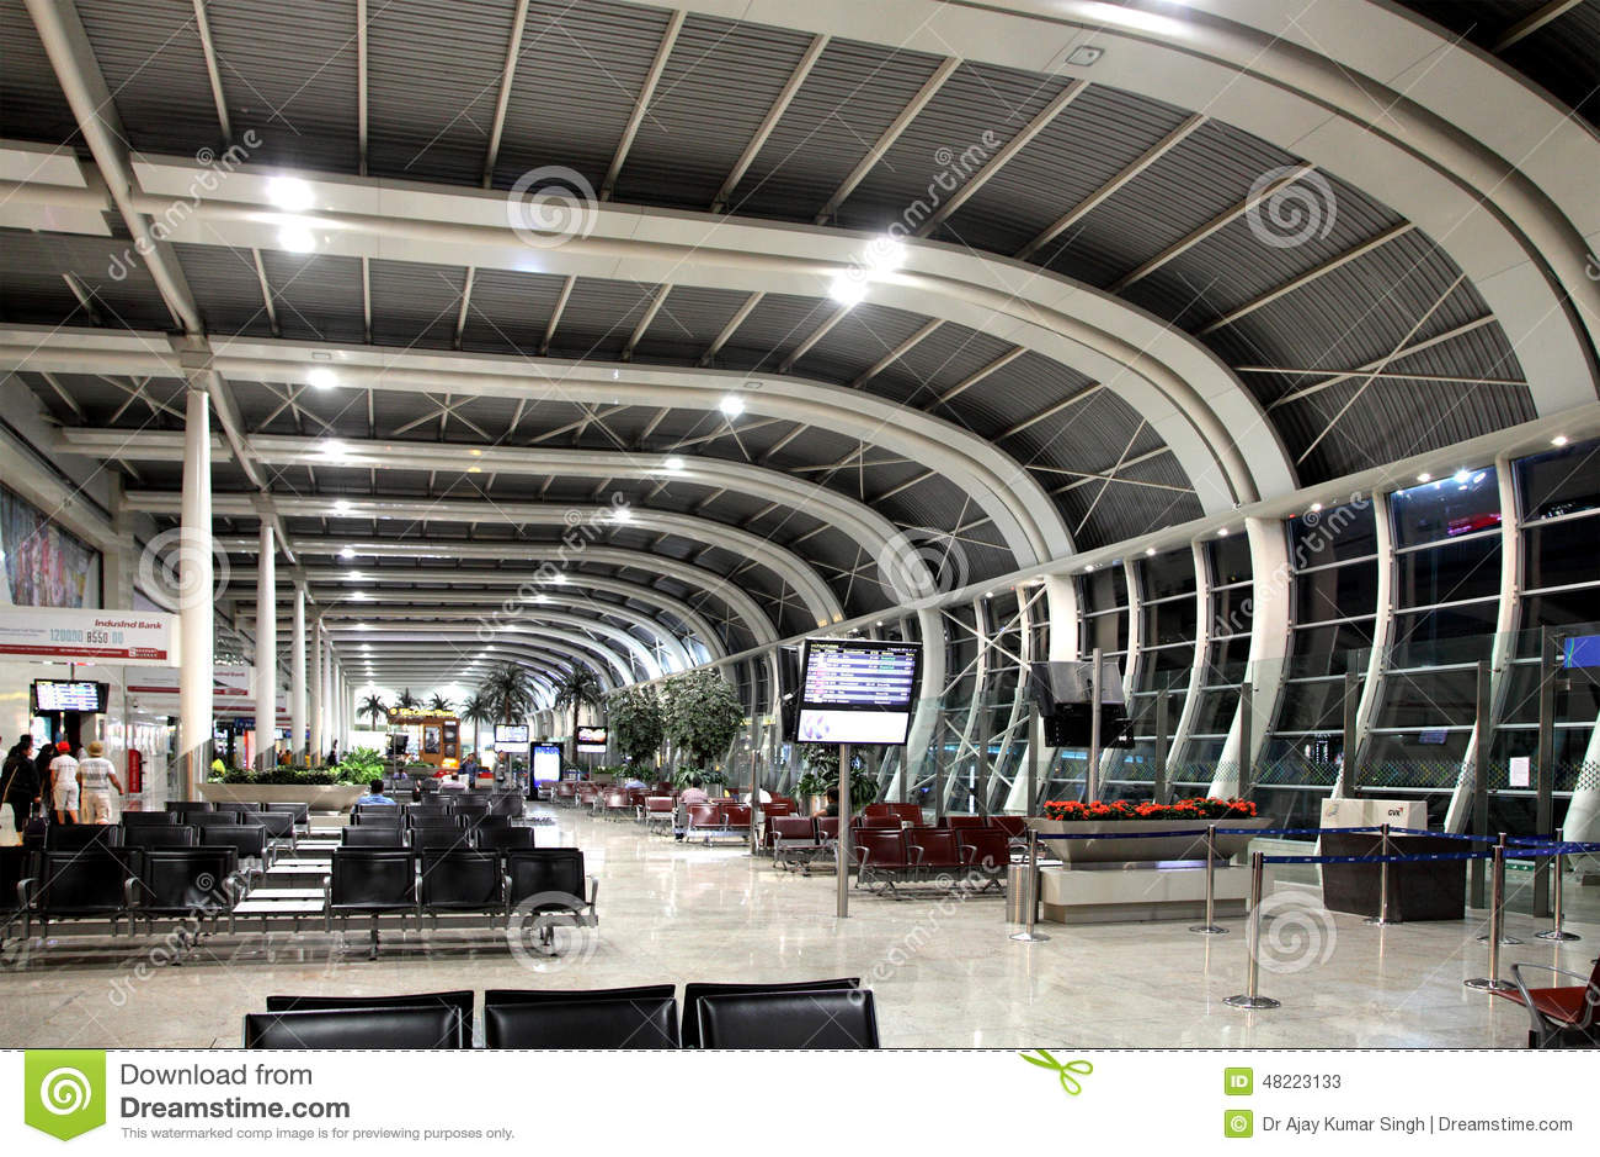 Aeroporto Kuwait : Departure launge of mumbai domestic airport editorial